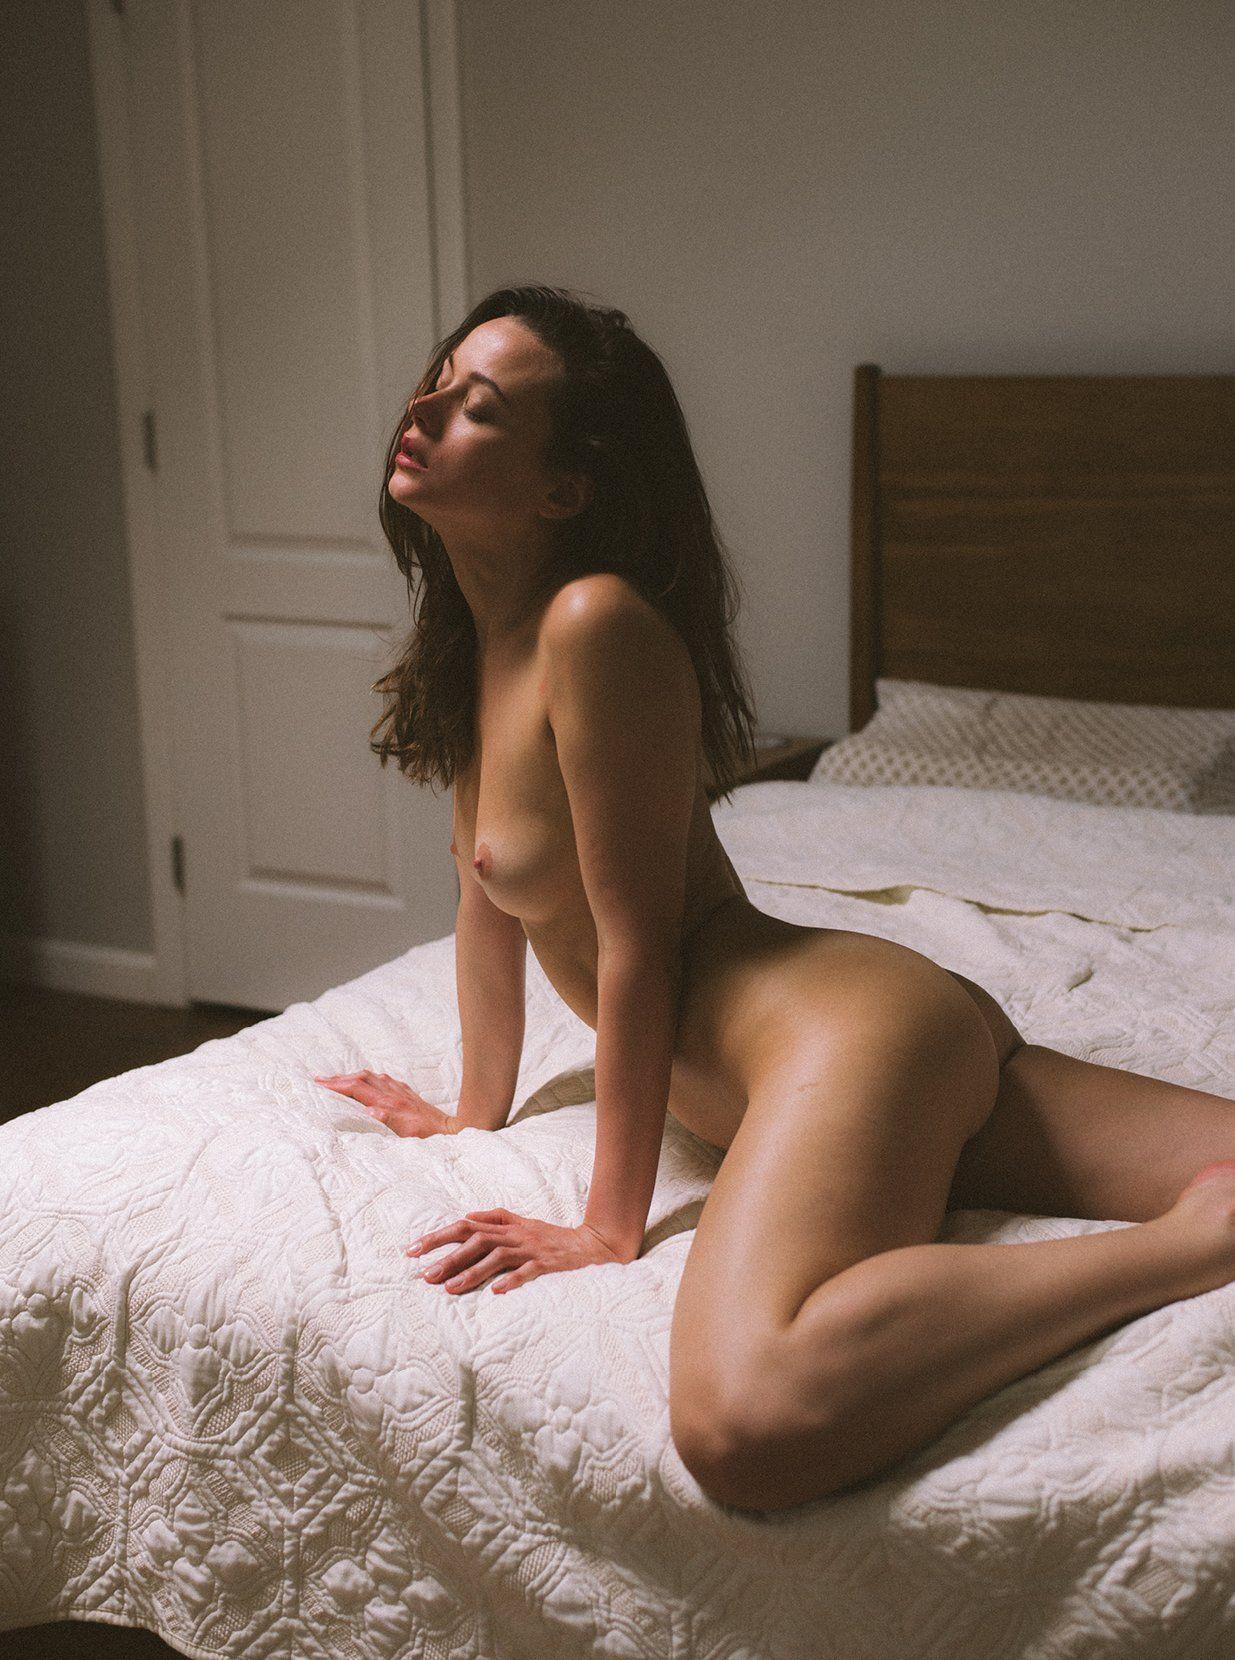 Paparazzi Legs Dawn French  nude (29 fotos), 2019, lingerie